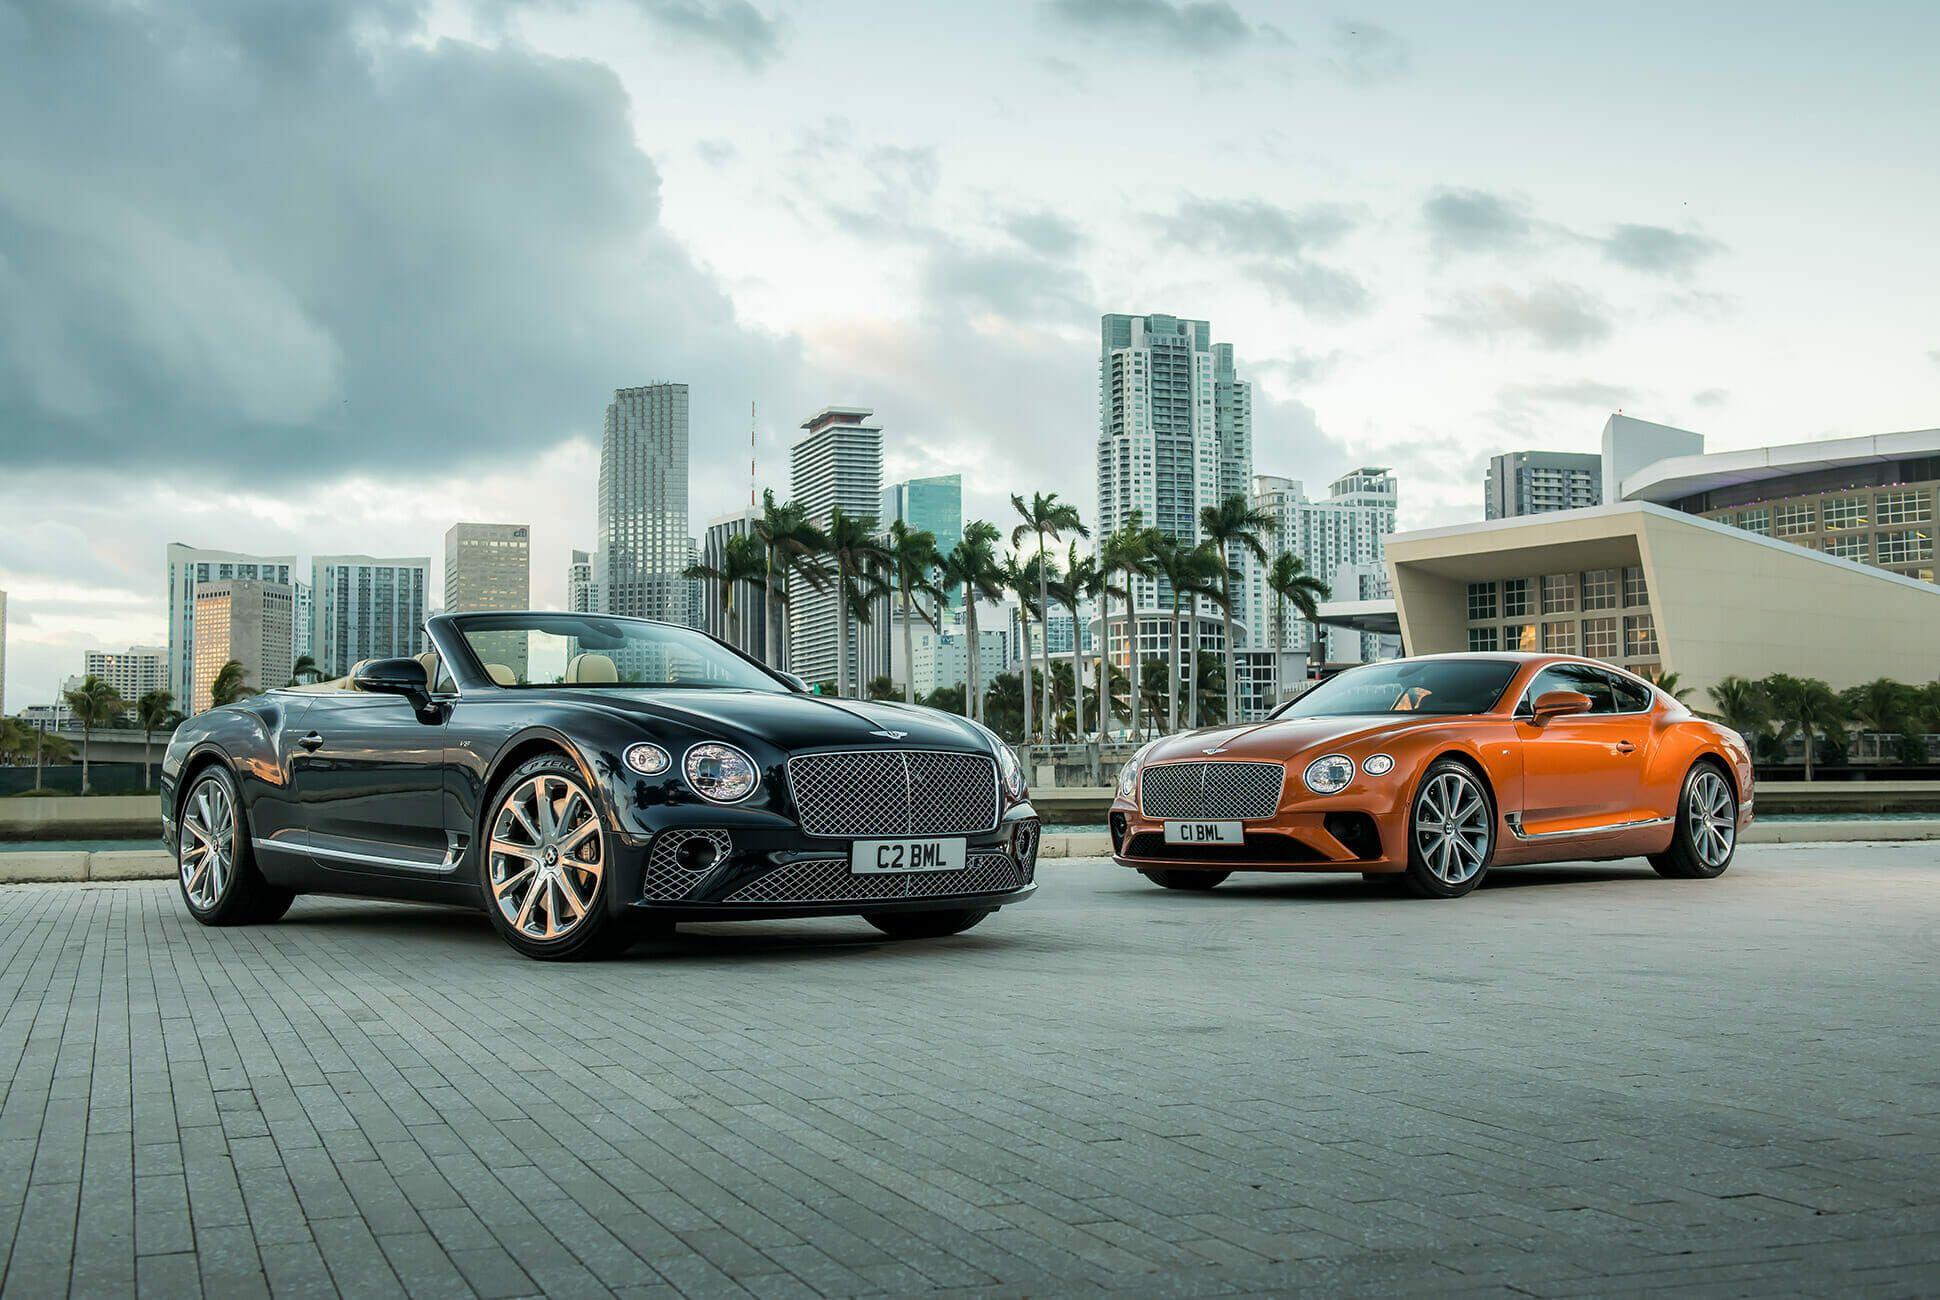 Bentley-Continental-GT-Convertible-V8-gear-patrol-slide-010